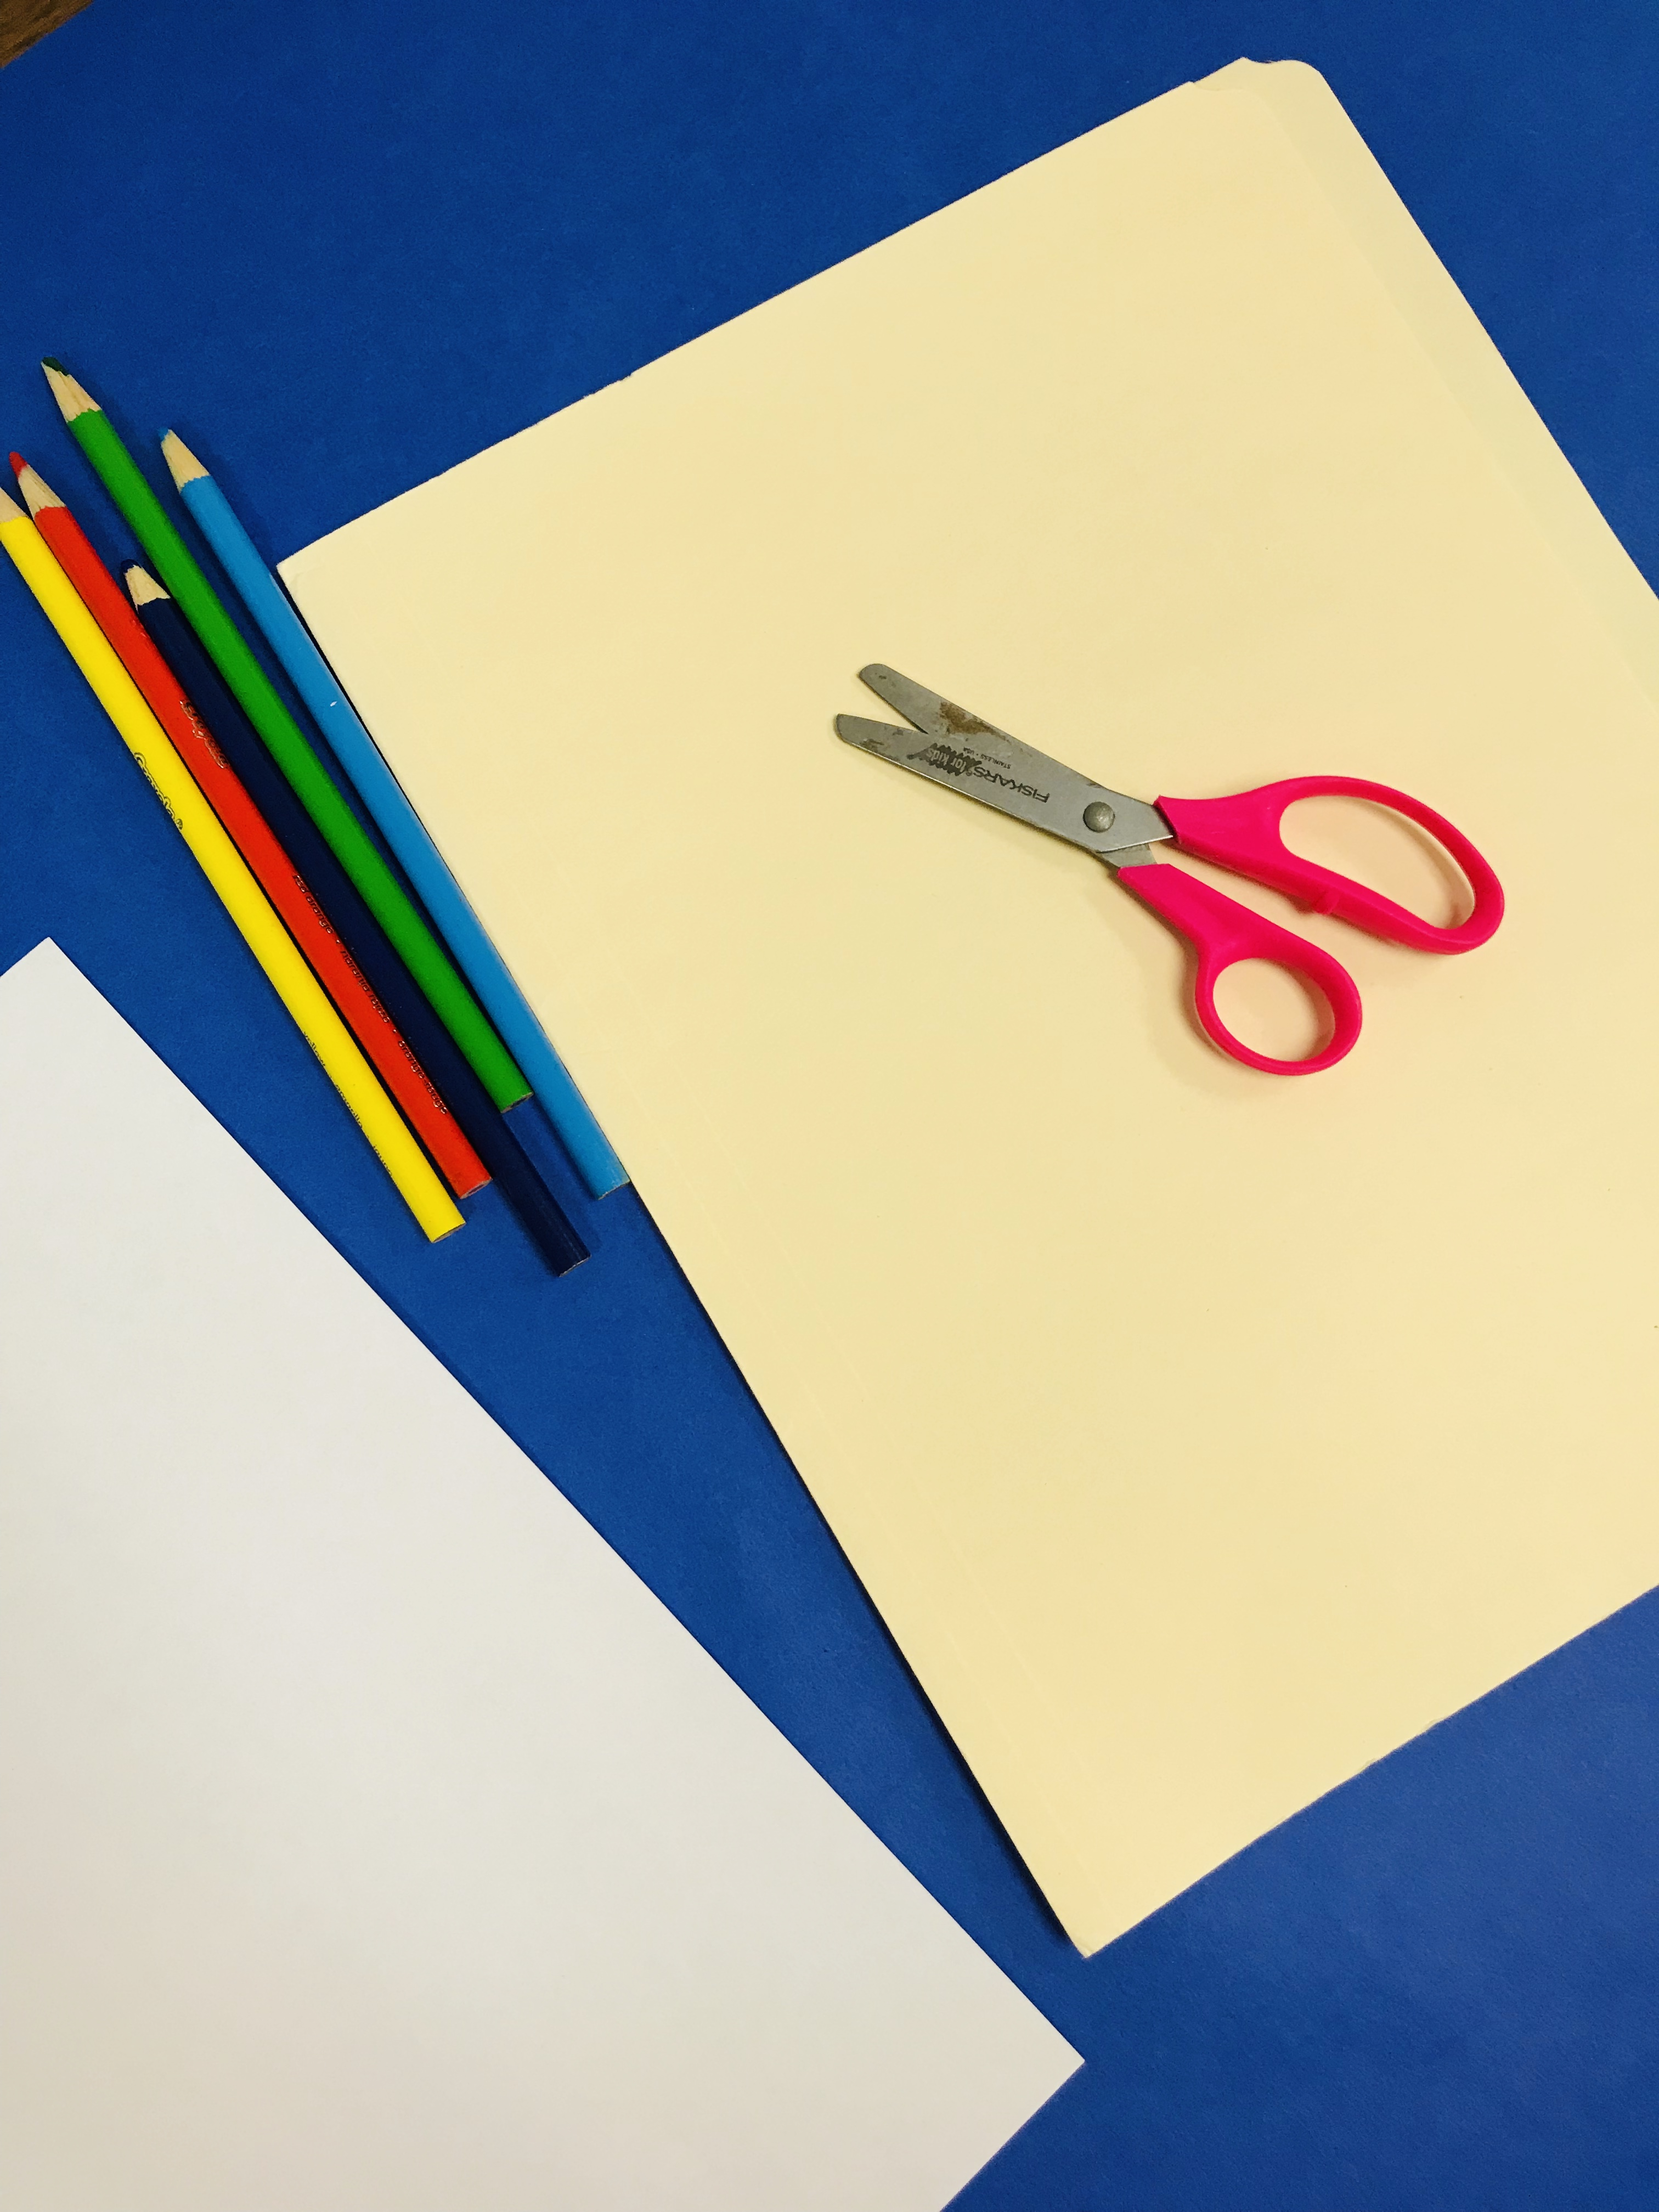 Folder, colored pencils and scissors